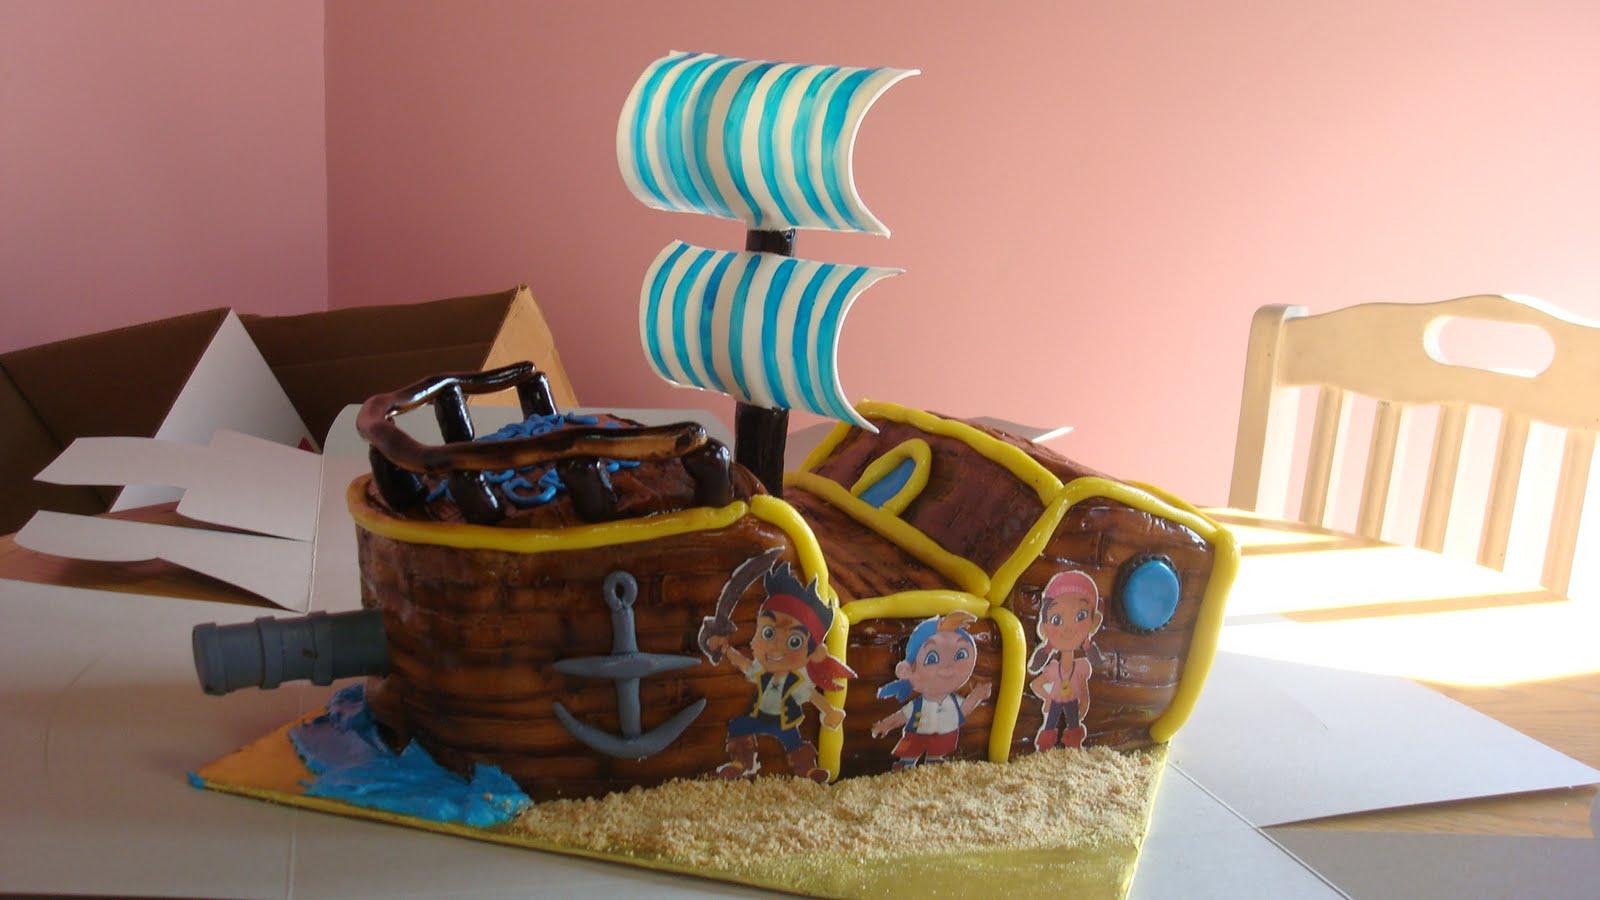 jake and the neverland pirates cake walmart - photo #20